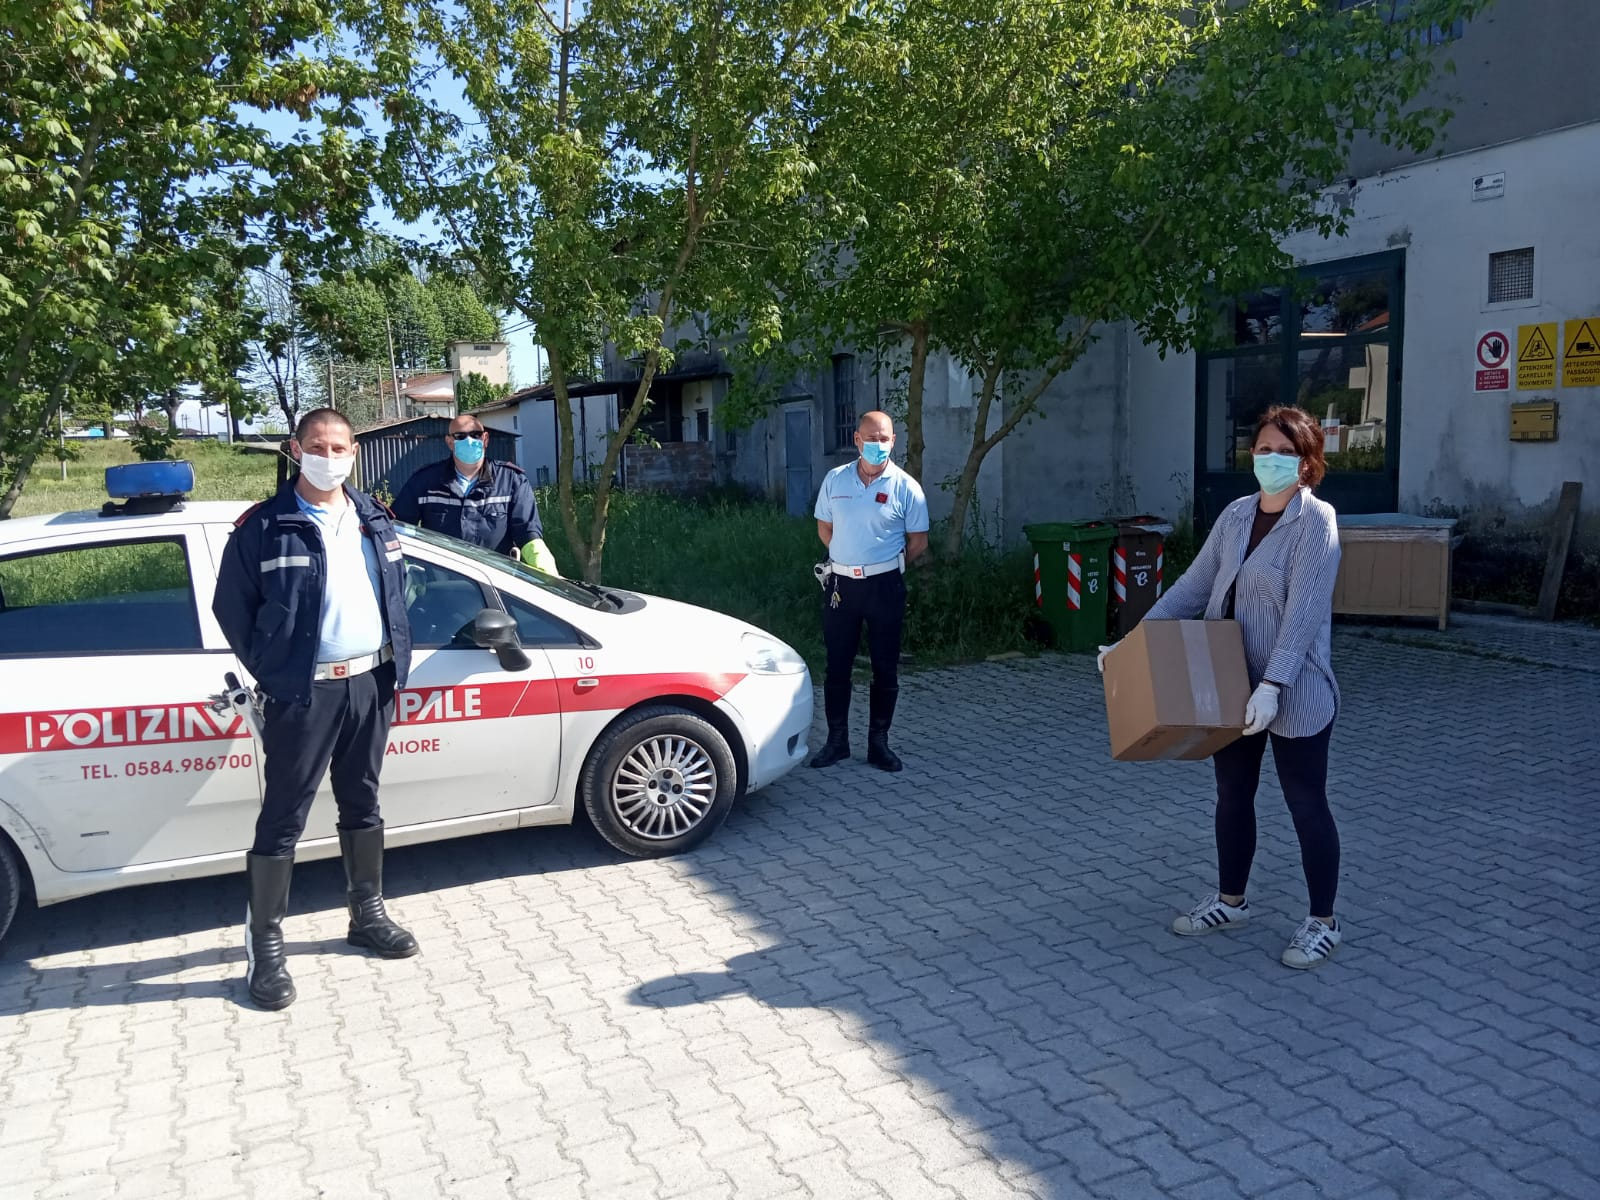 La ditta Nostrum regala 750 mascherine ai vigili urbani di Camaiore